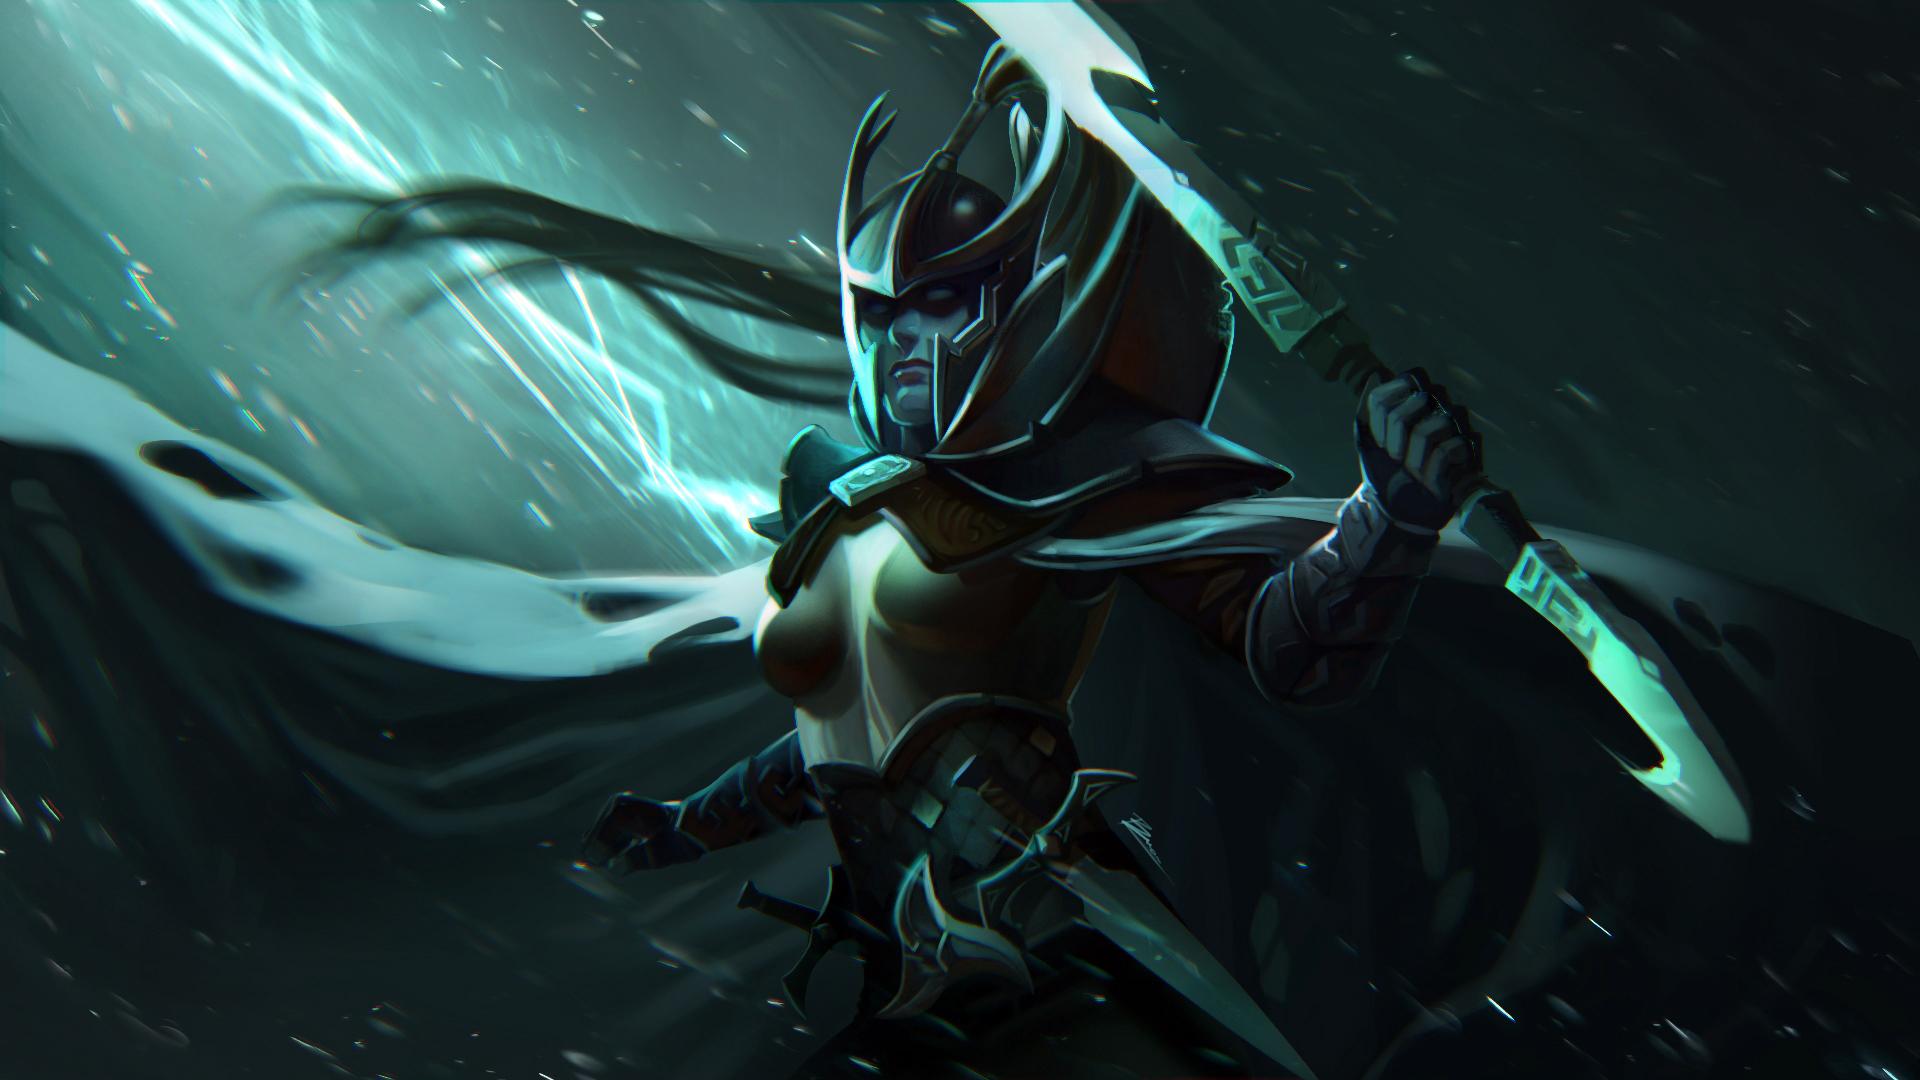 Dota 2 Phantom Assassin Wallpaper HD